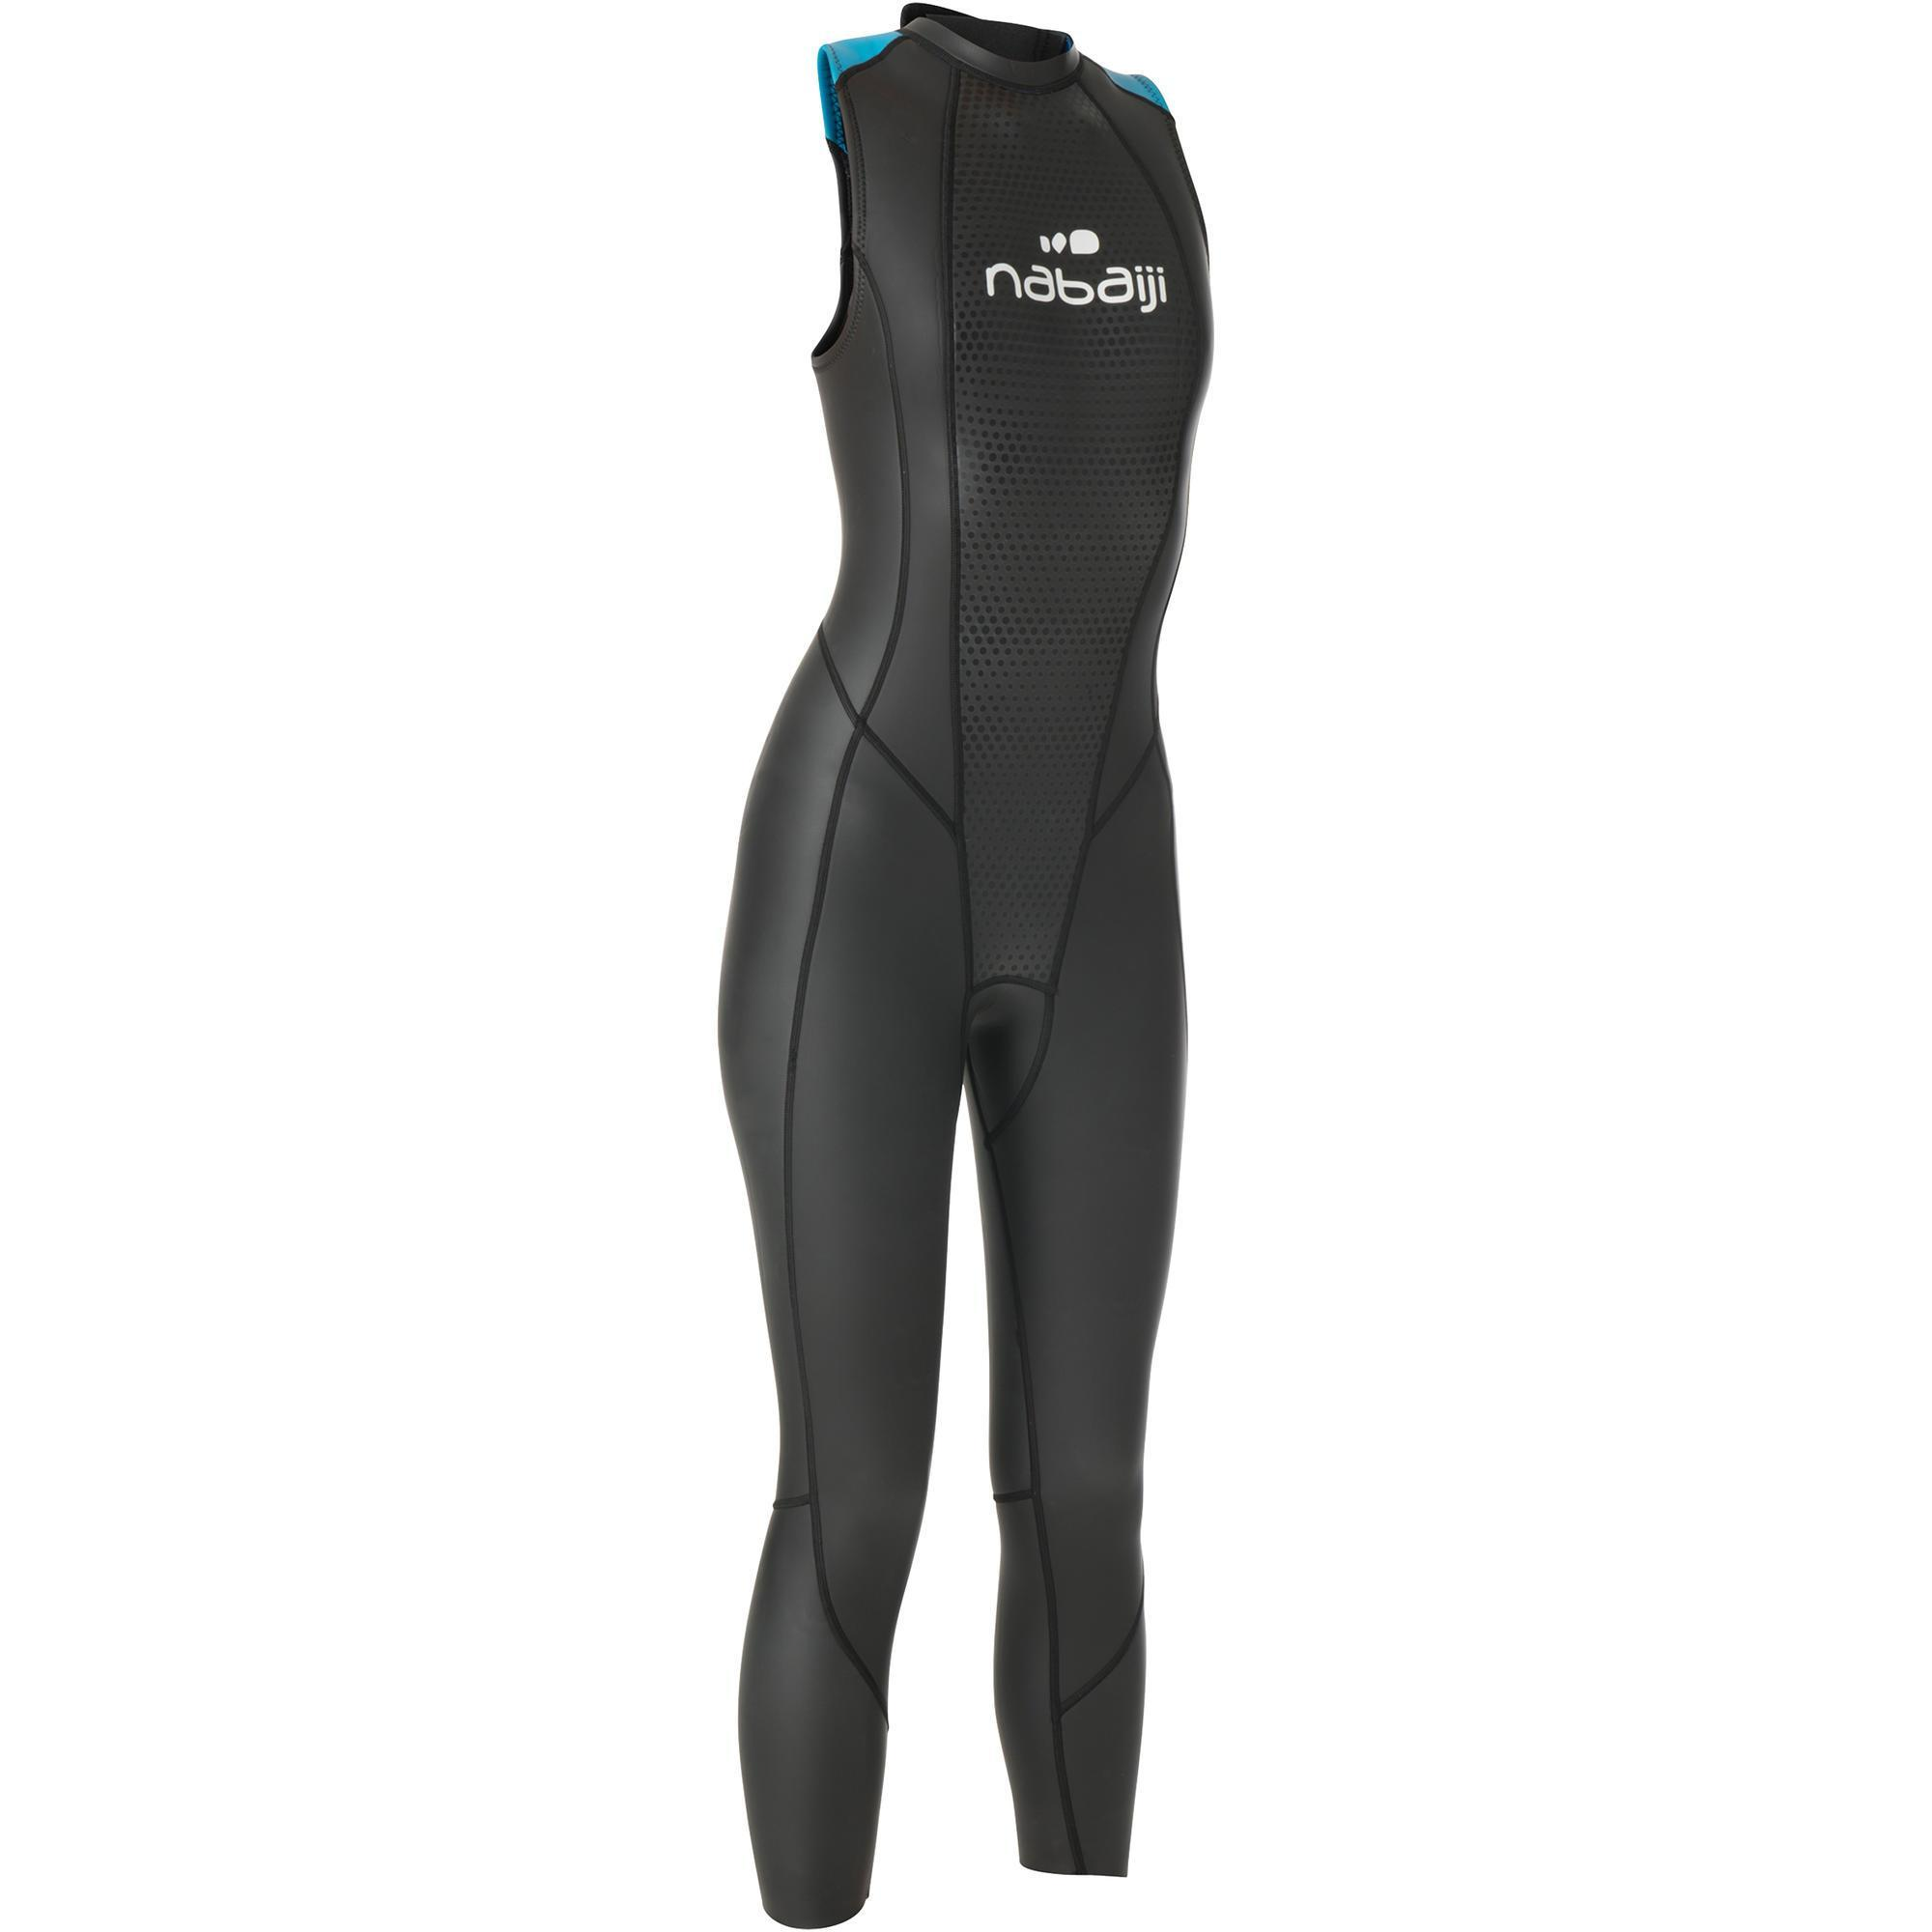 Nabaiji Mouwloze neopreen dames wetsuit OWS 500 2,5/2 mm gematigd warm water